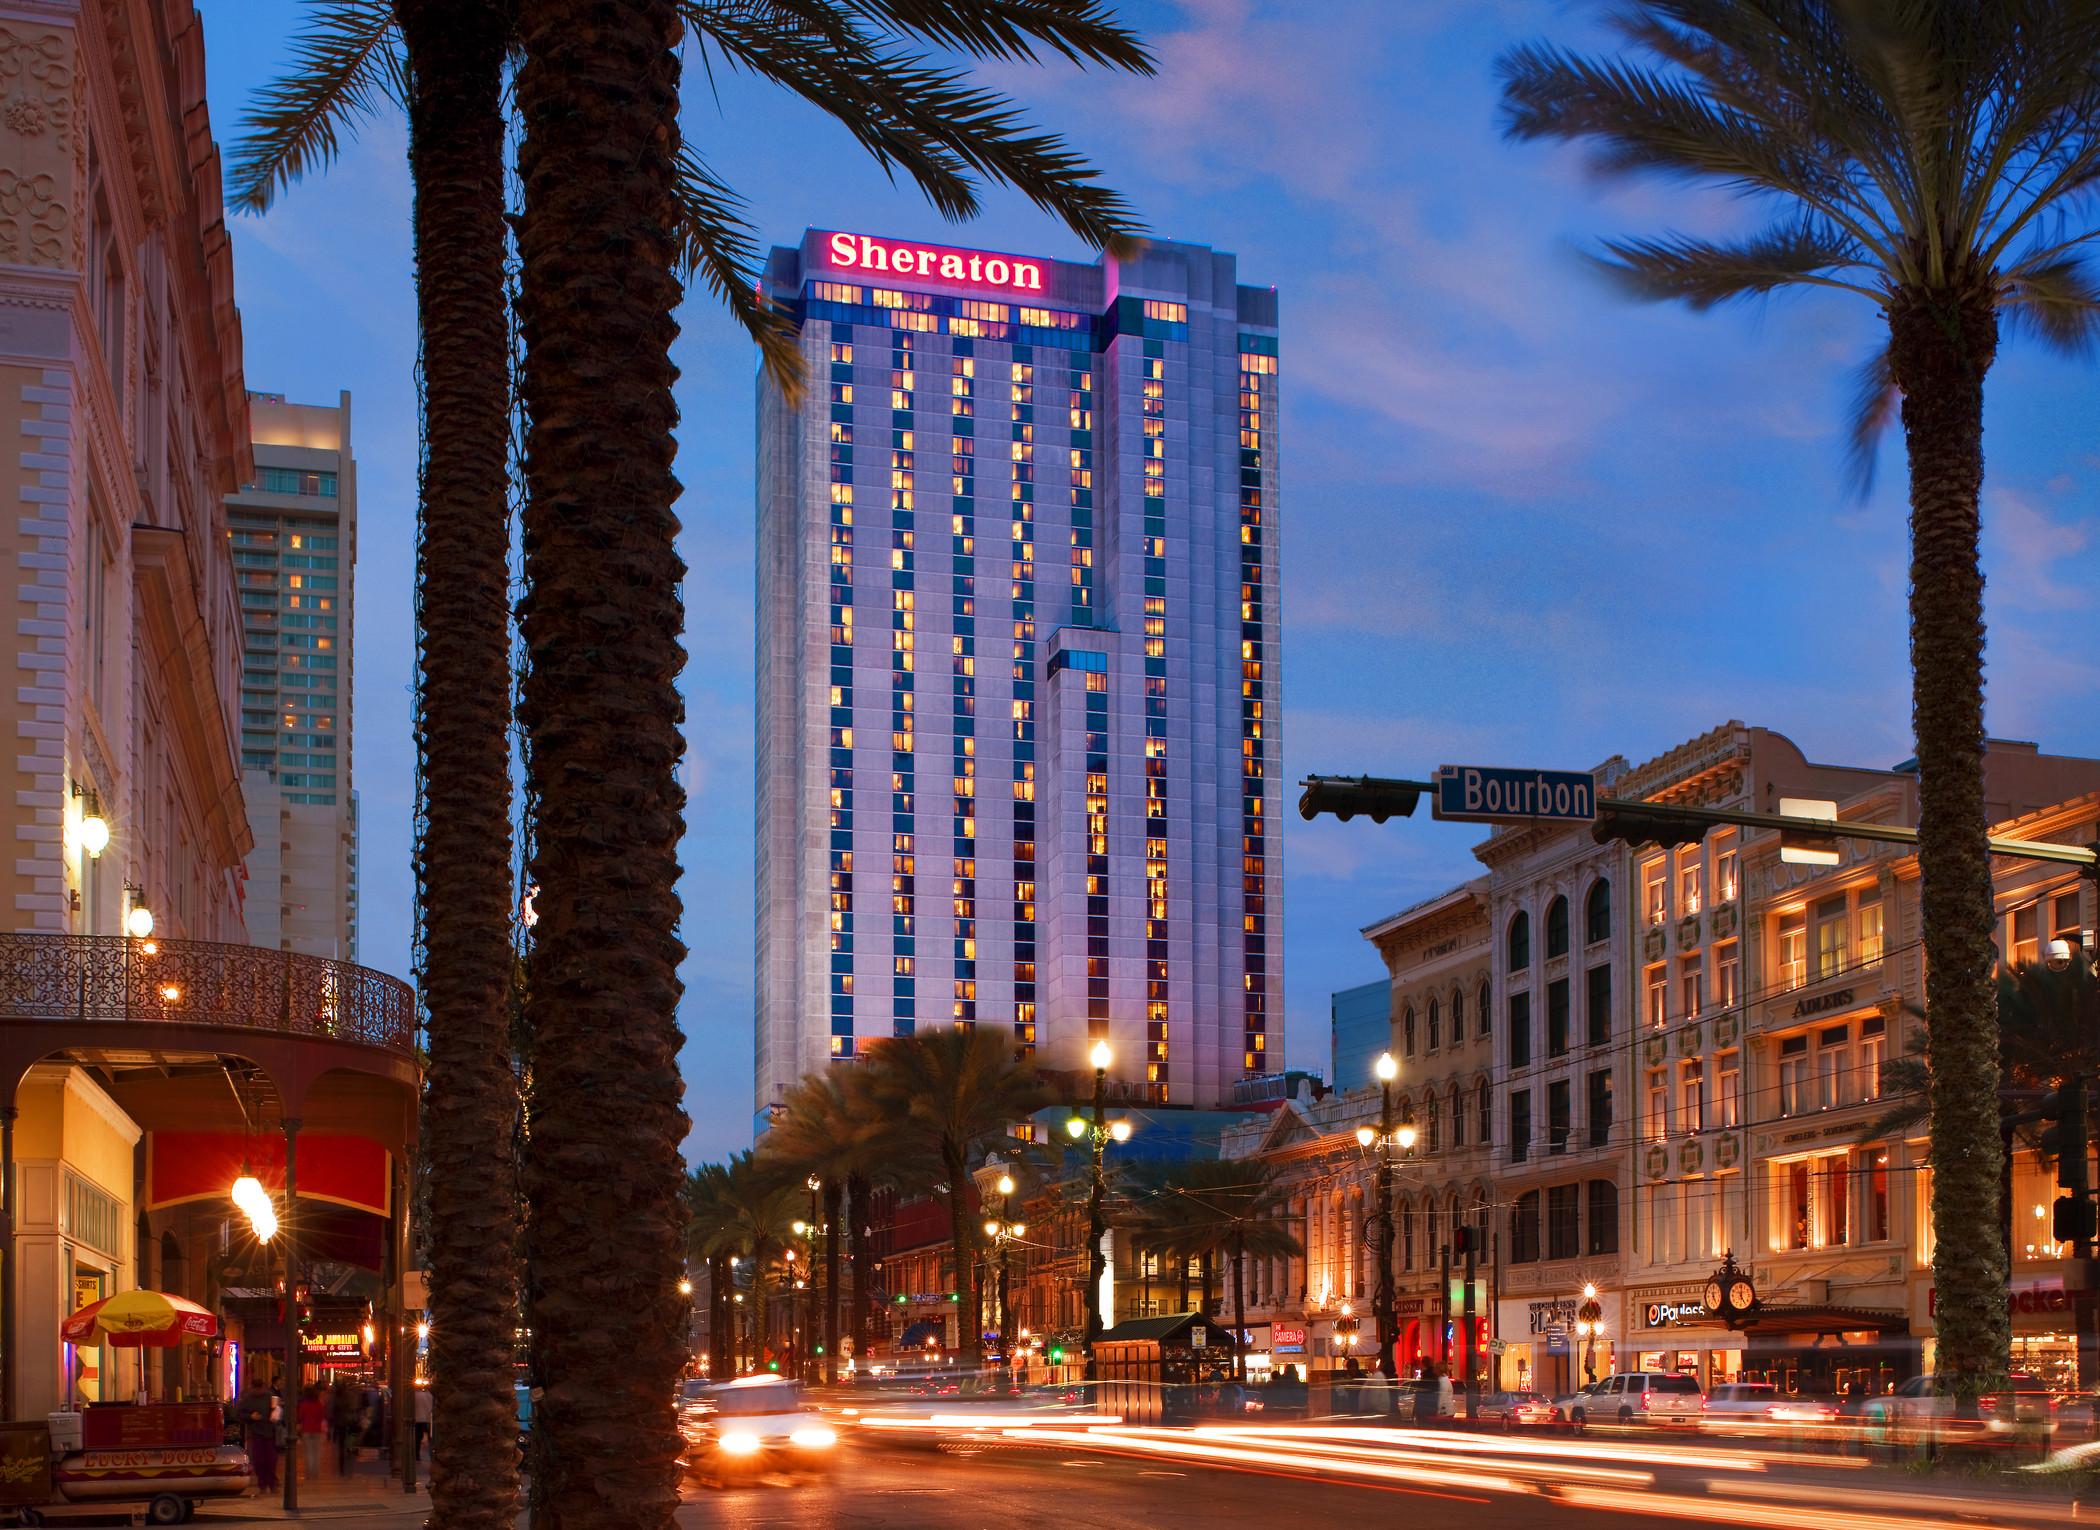 Sheraton New Orleans Hotel